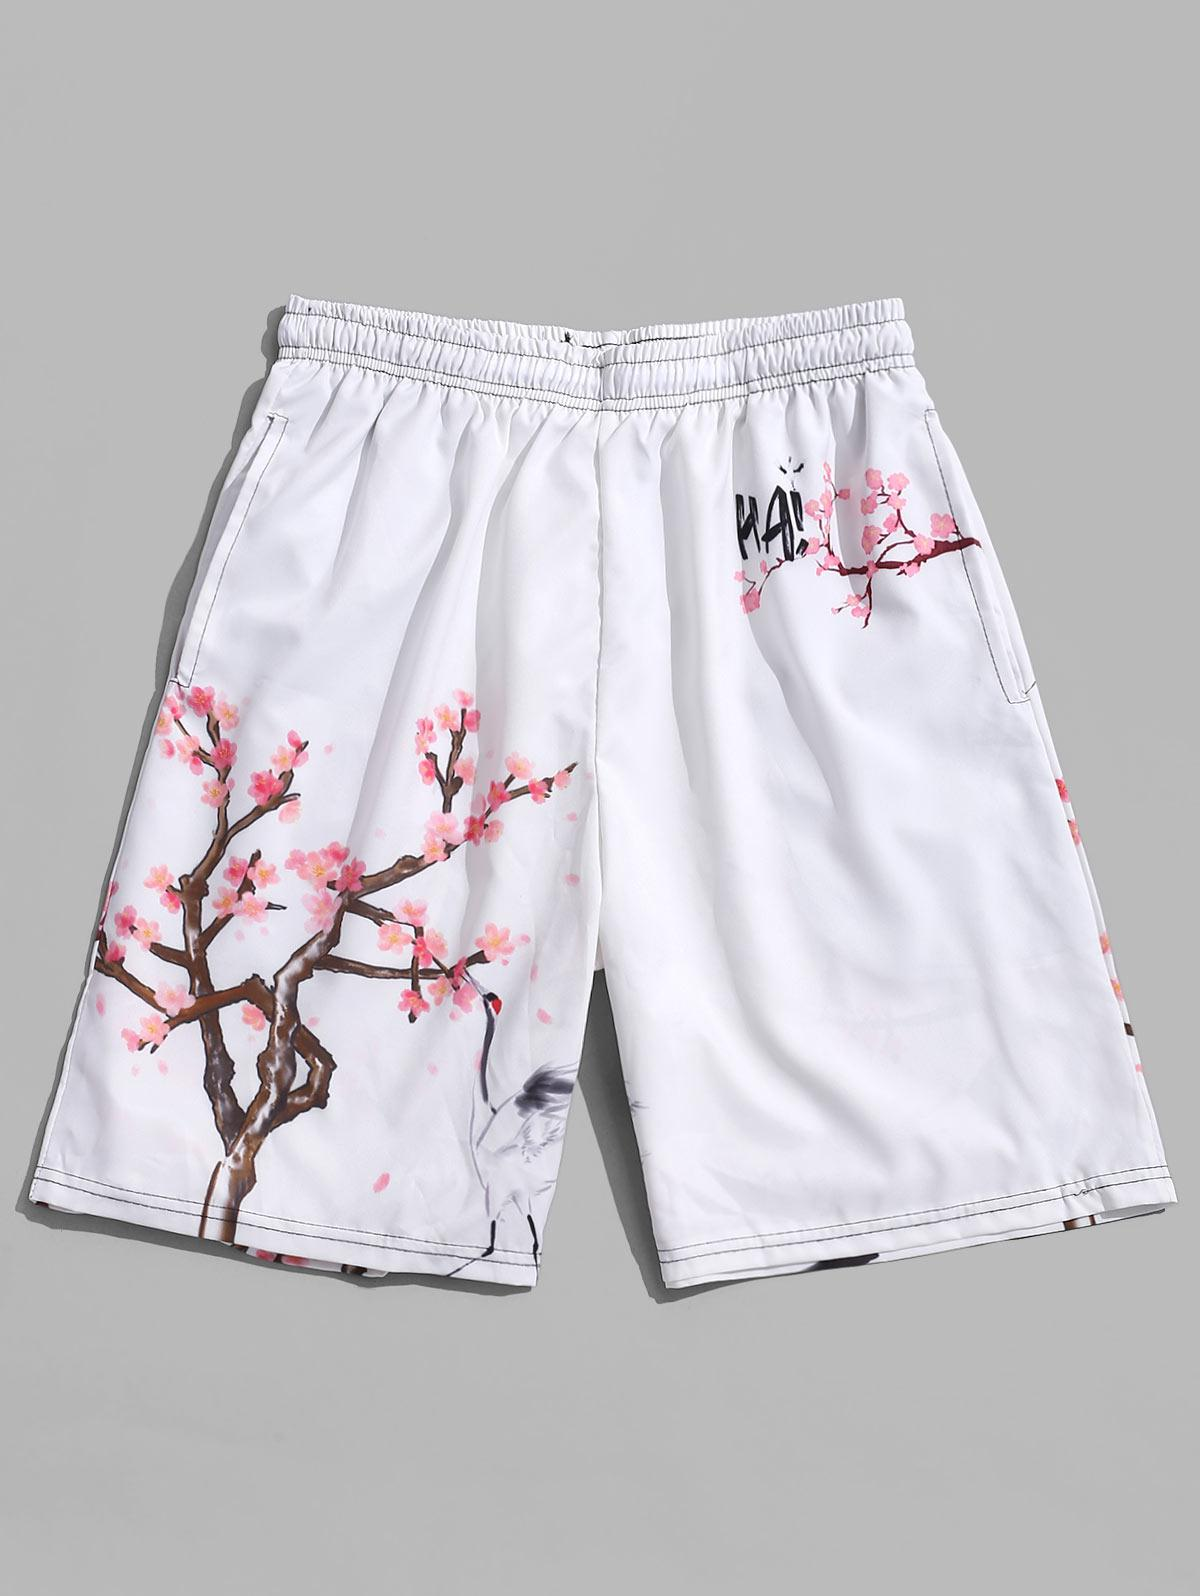 Women Swim Trunks Cherry Tree Branches White Little Flowers Red Beach Board Shorts